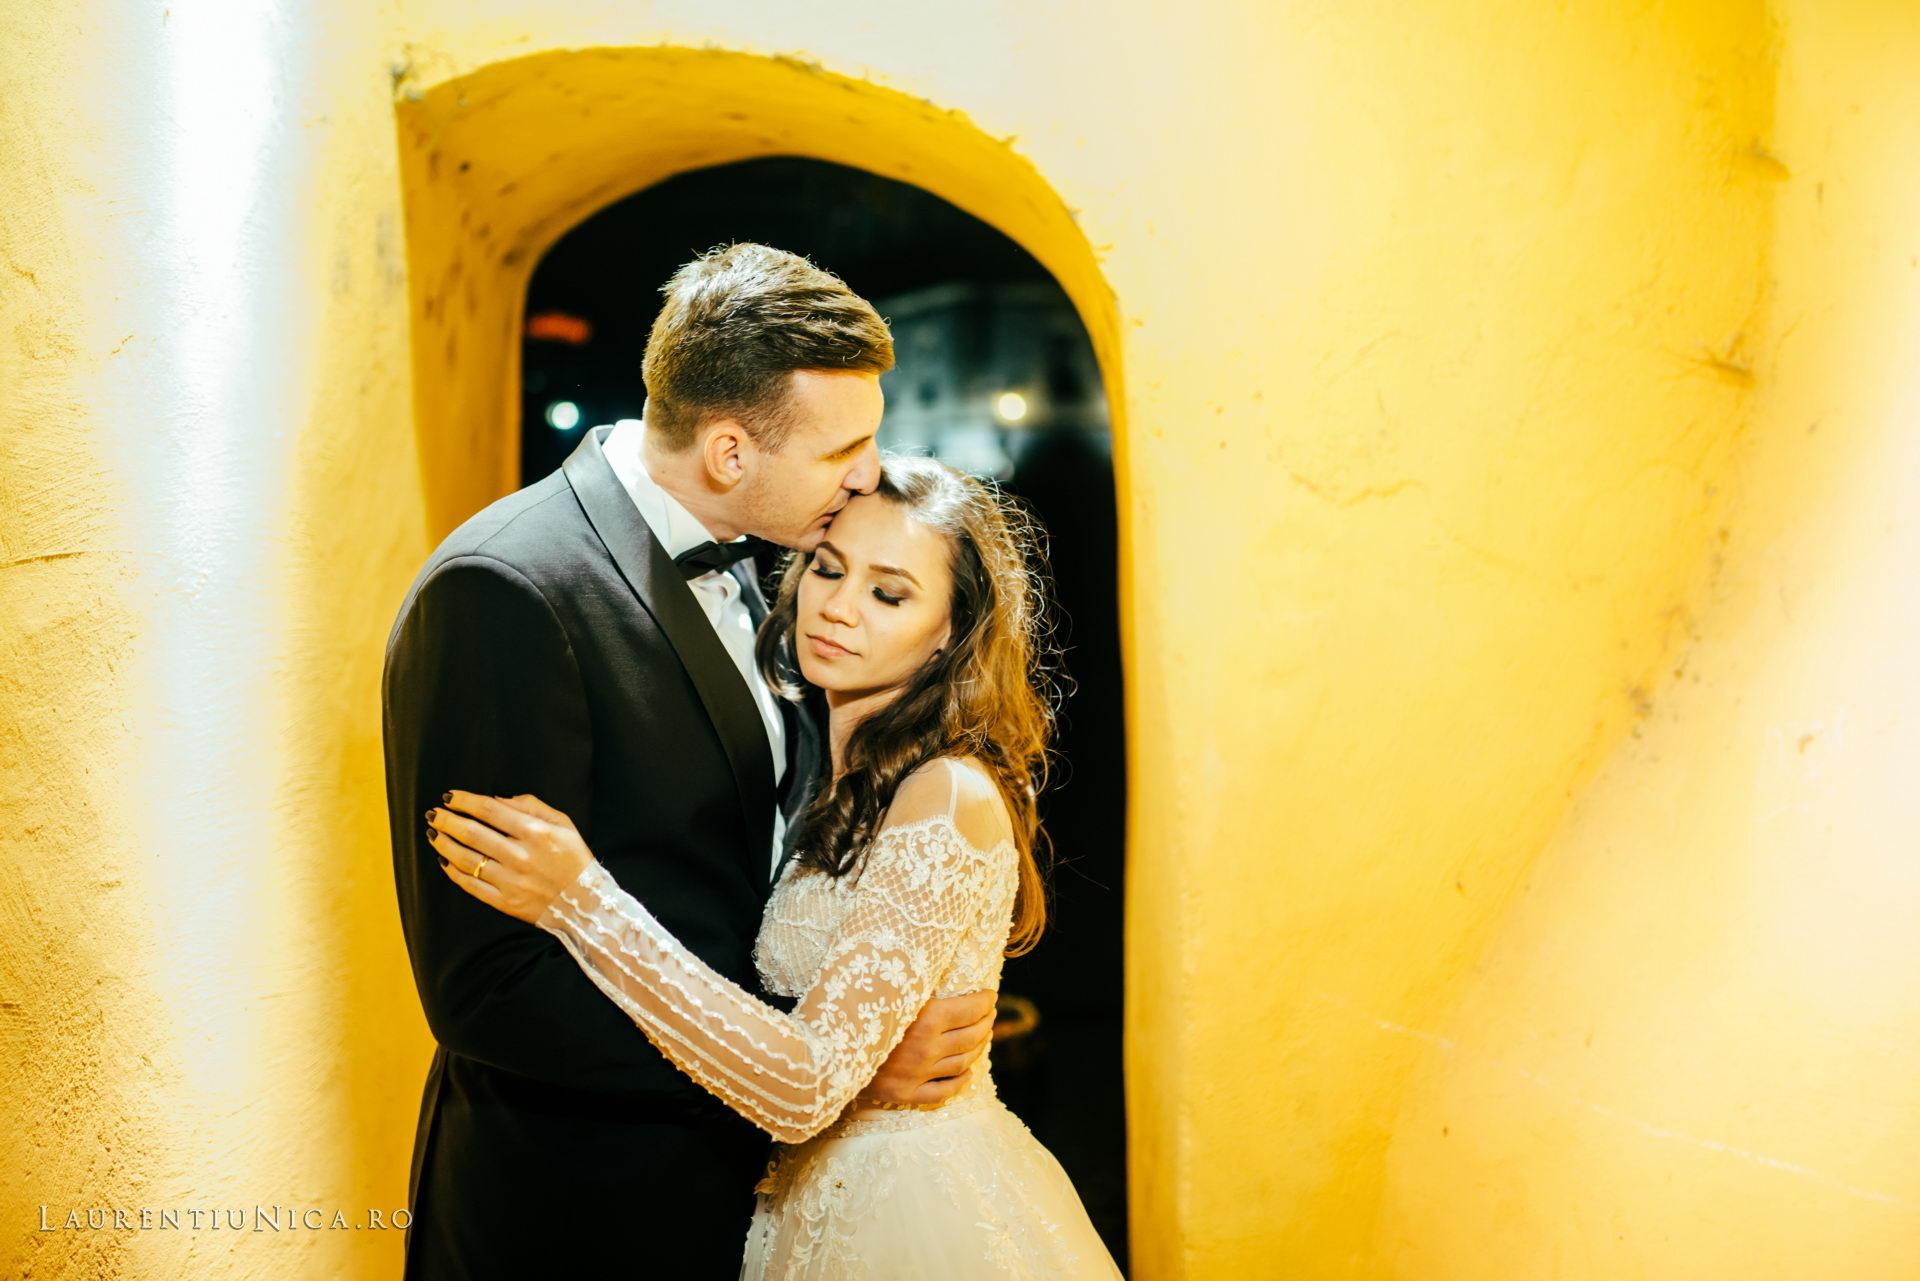 lili-si-dan-fotografii-nunta-after-wedding-sighisoara-laurentiu-nica46